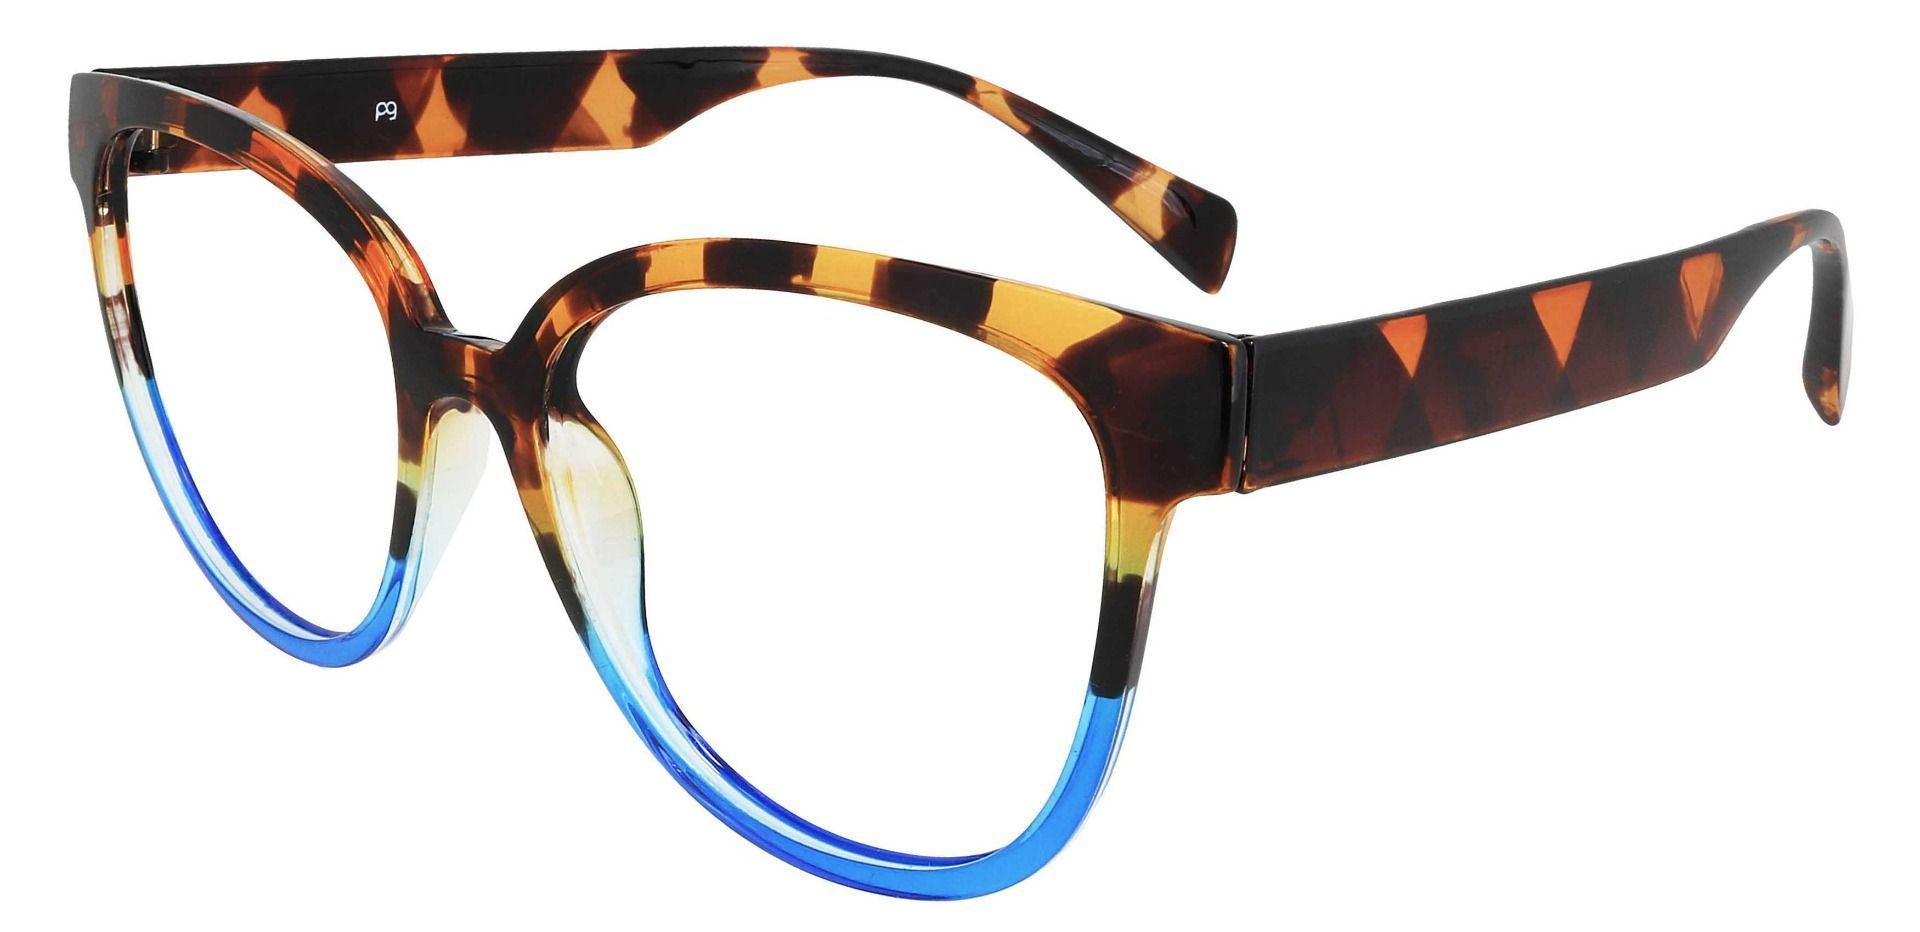 Newport Oval Prescription Glasses - Tortoise